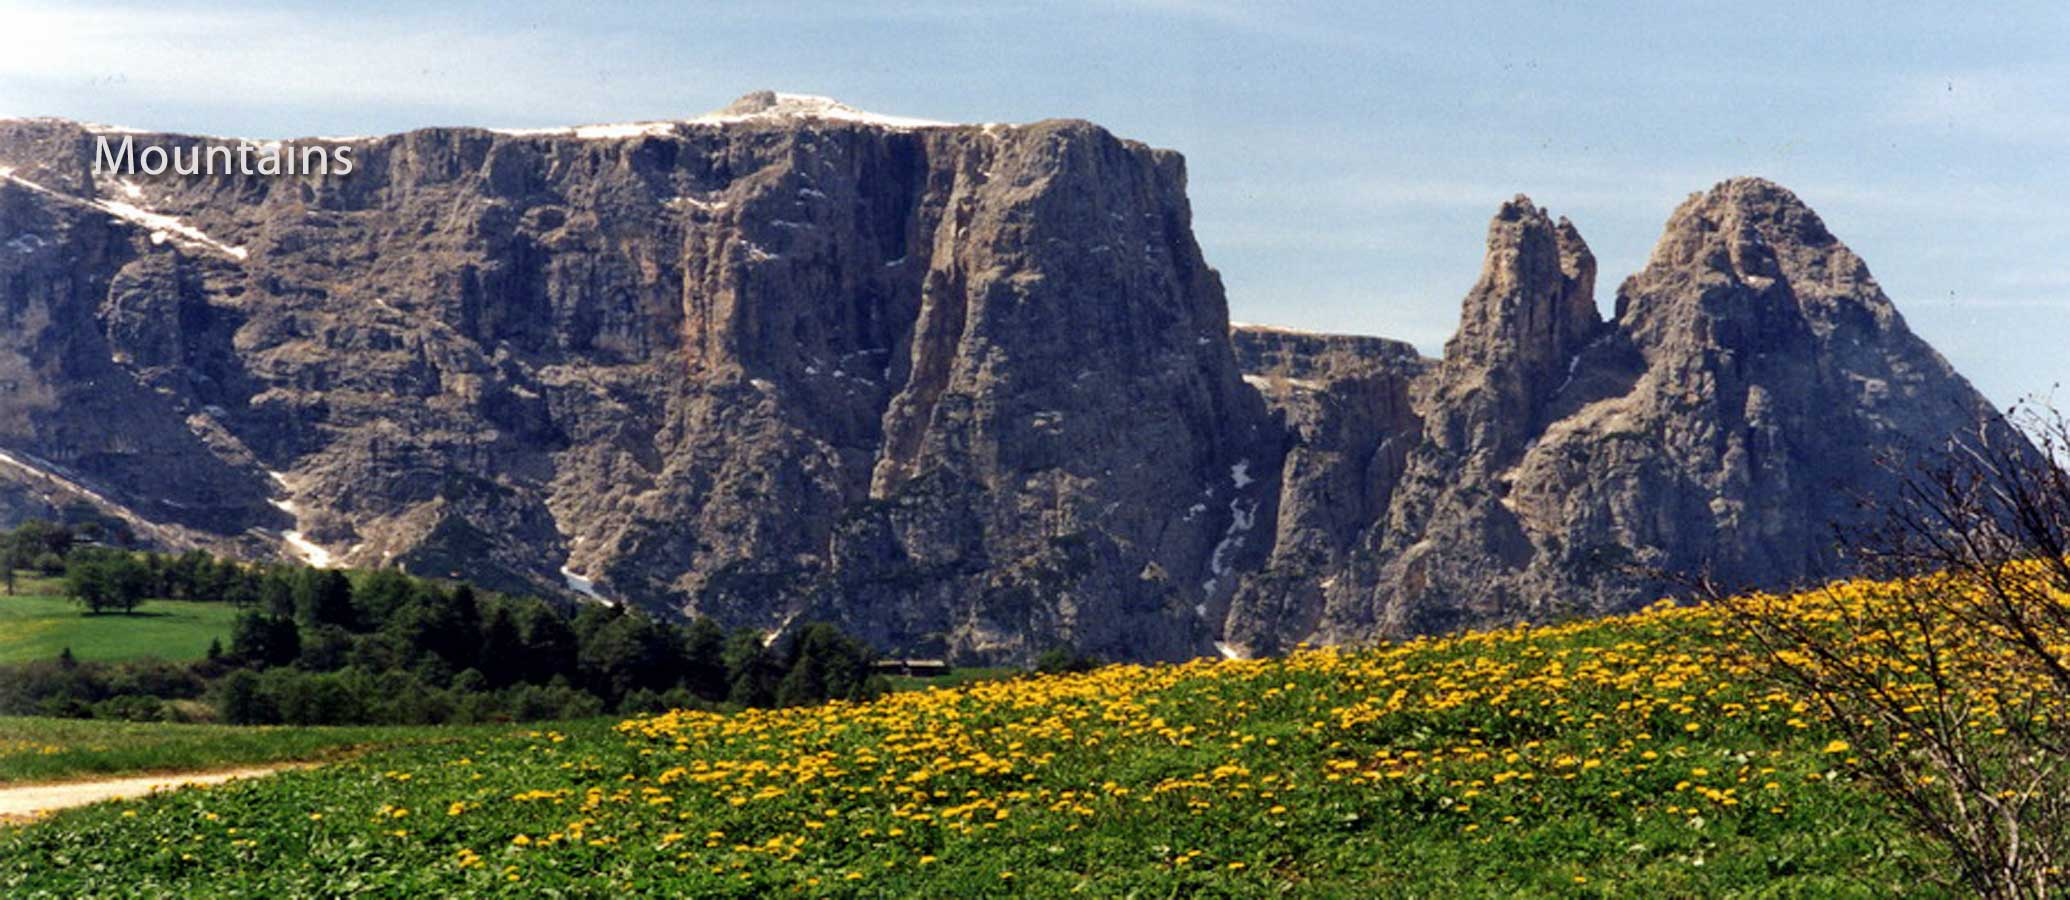 Mountains-Dolomites-Alip-di-Suisse-Mt.-Schlern-Marsha-J-Black-900